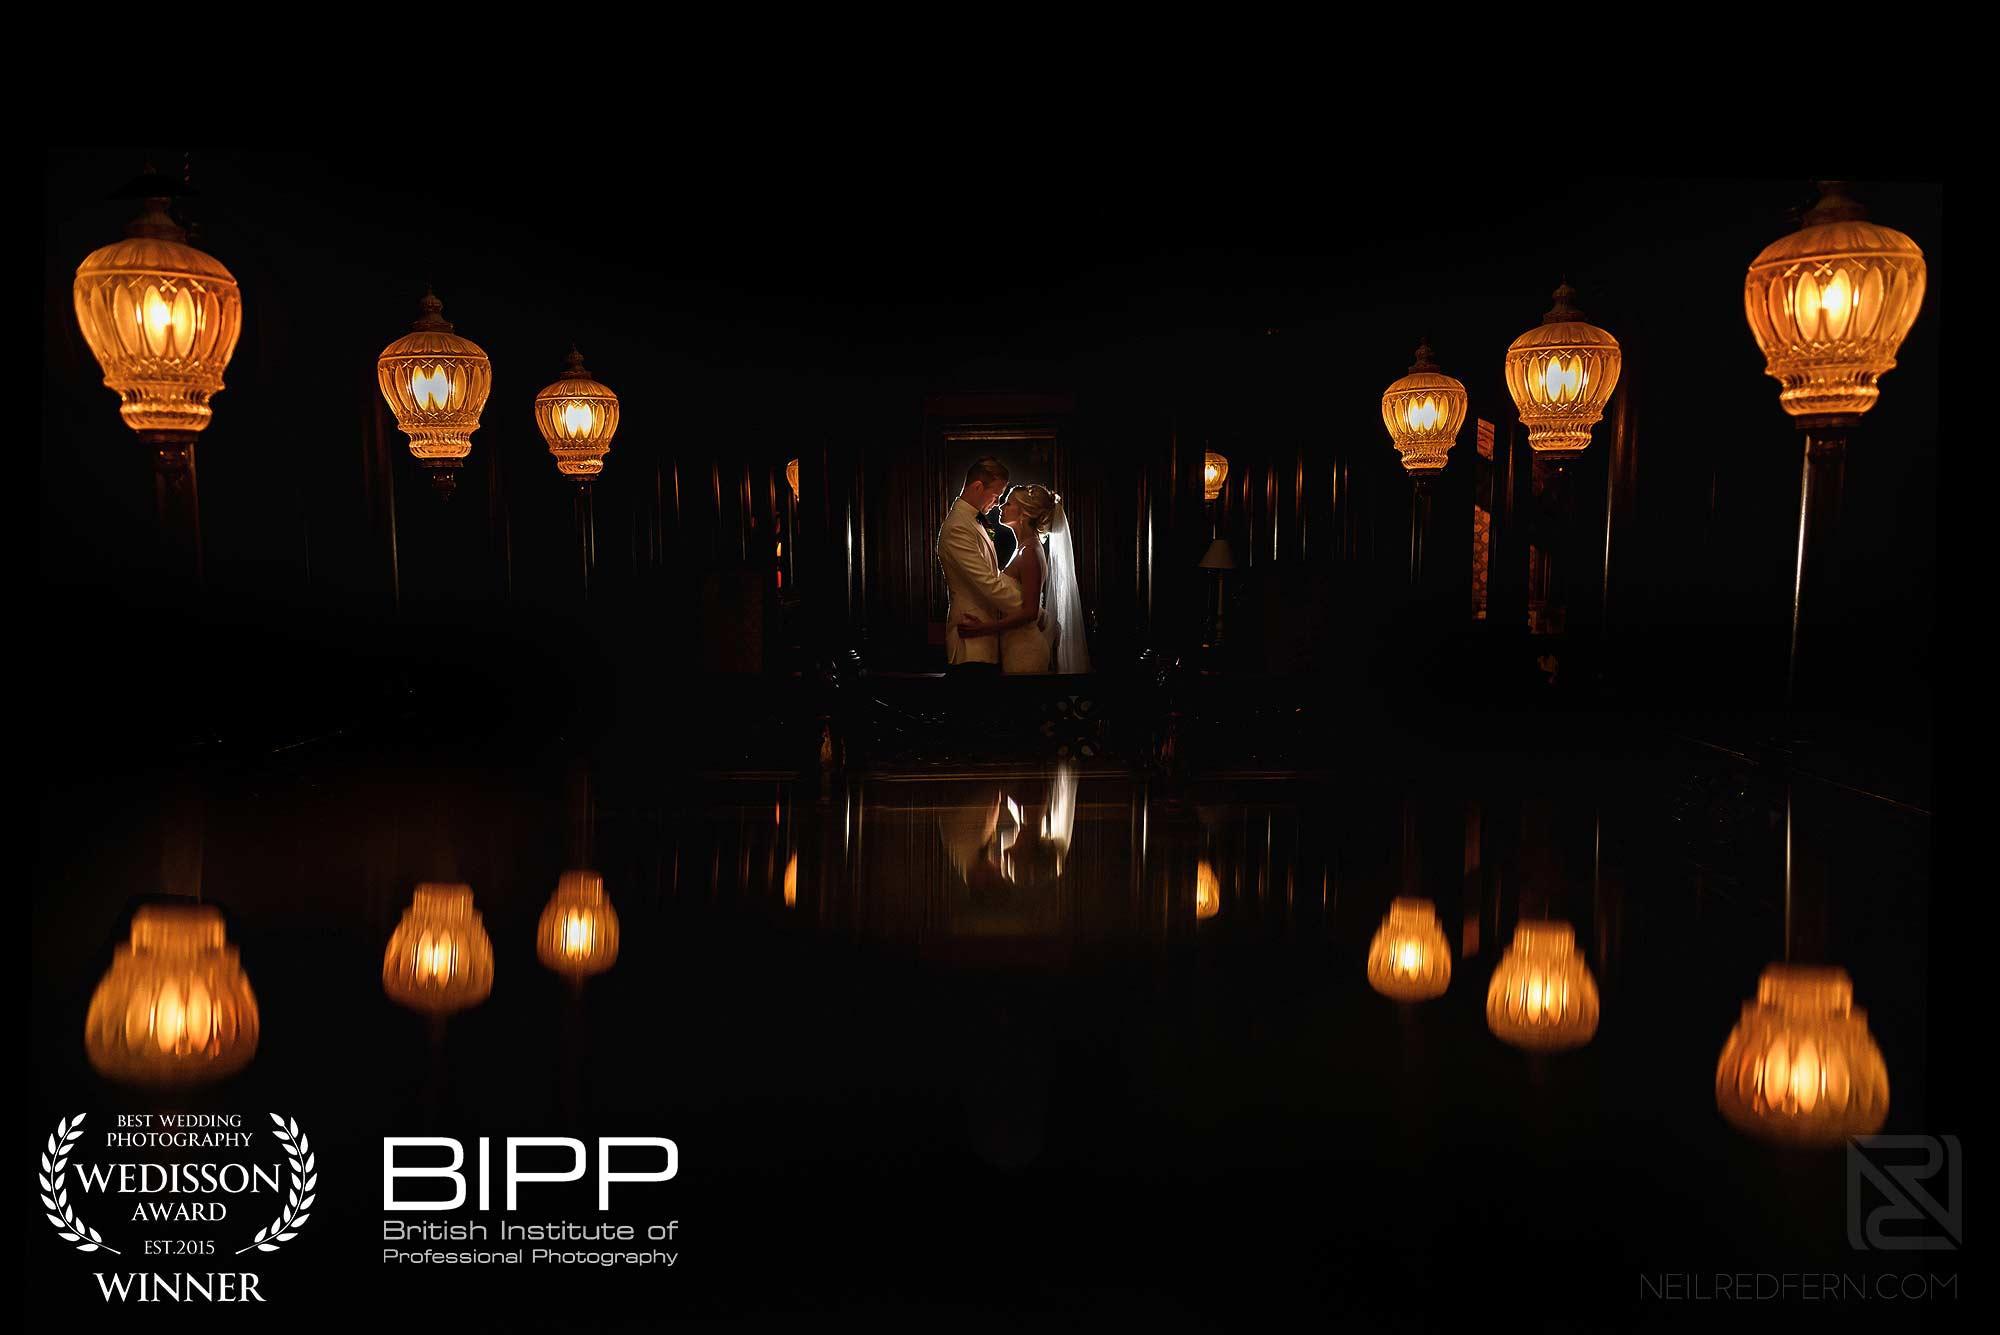 BIPP North West Gold Award in Creative weddings